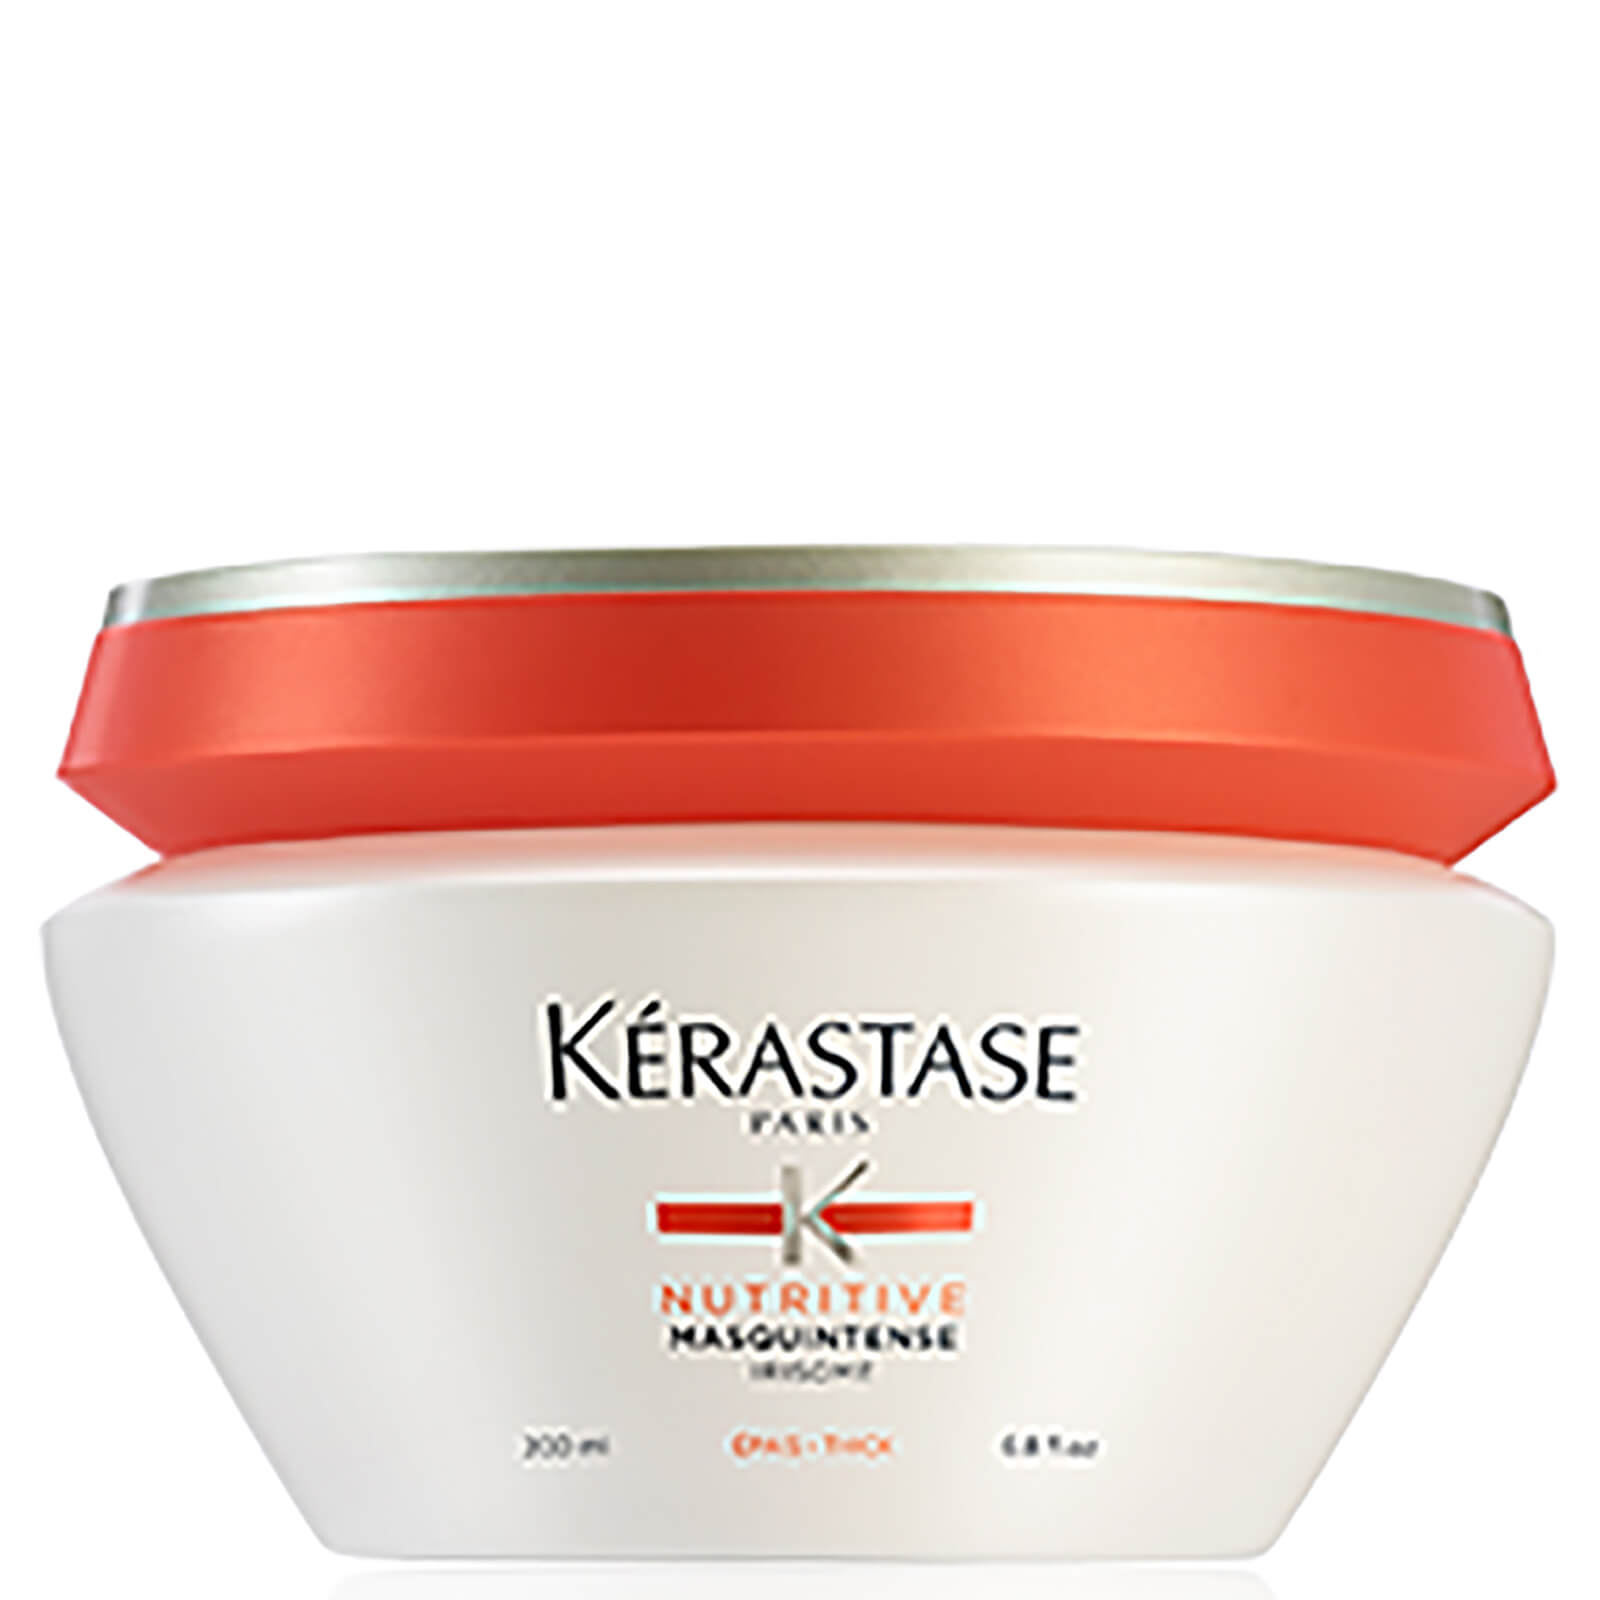 Kérastase Nutritive Masquintense Cheveux Epais (per capelli spessi) 200ml